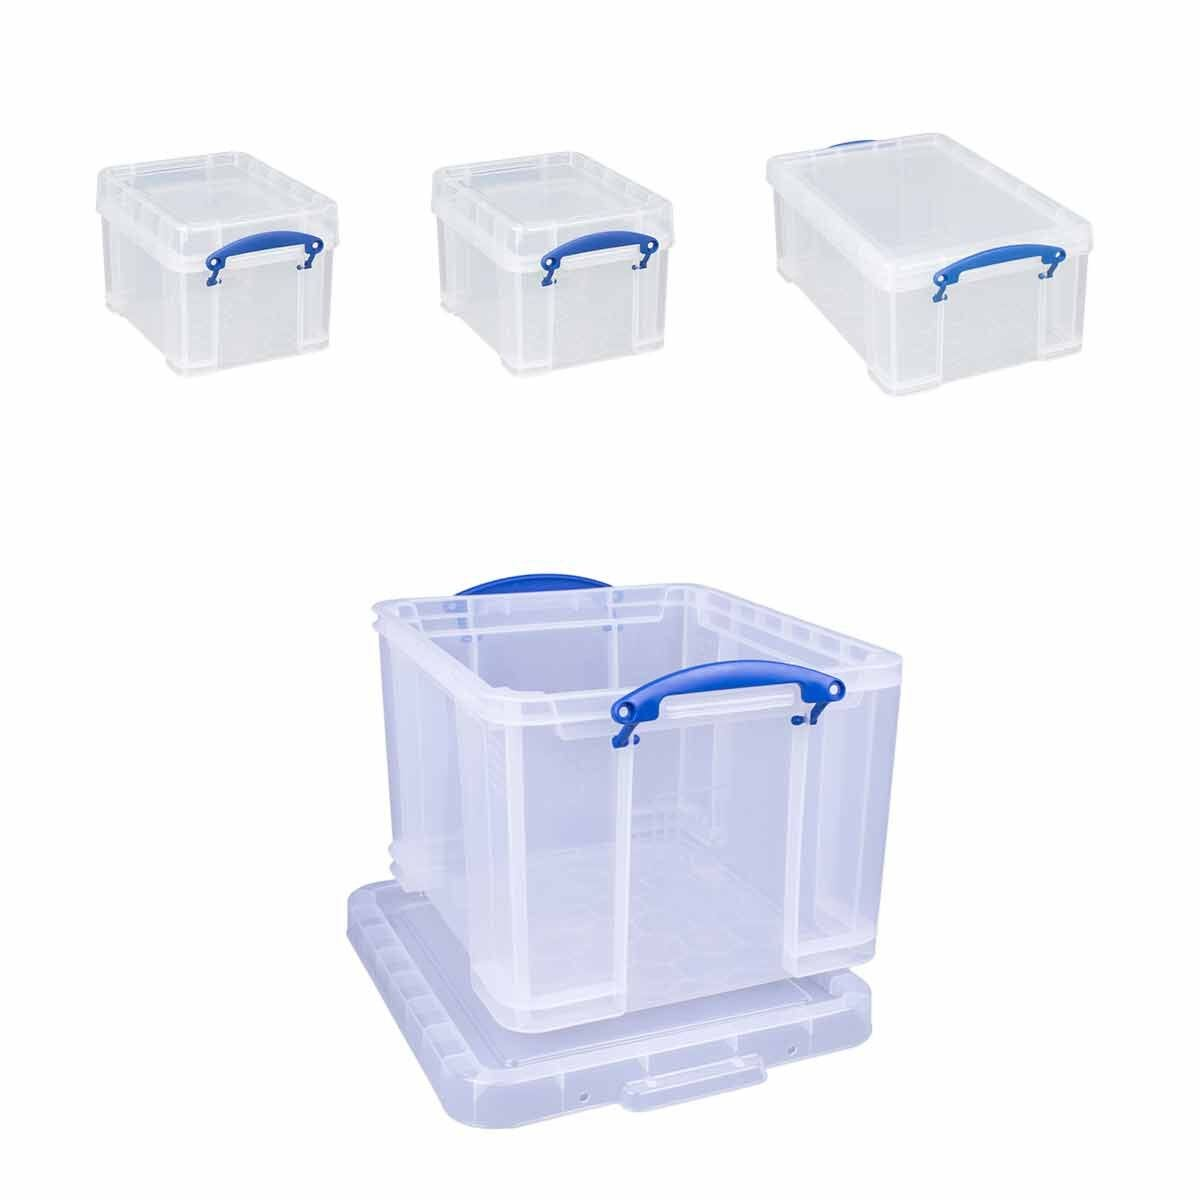 Really Useful Box 35 Litre Bonus Pack Assorted Sizes